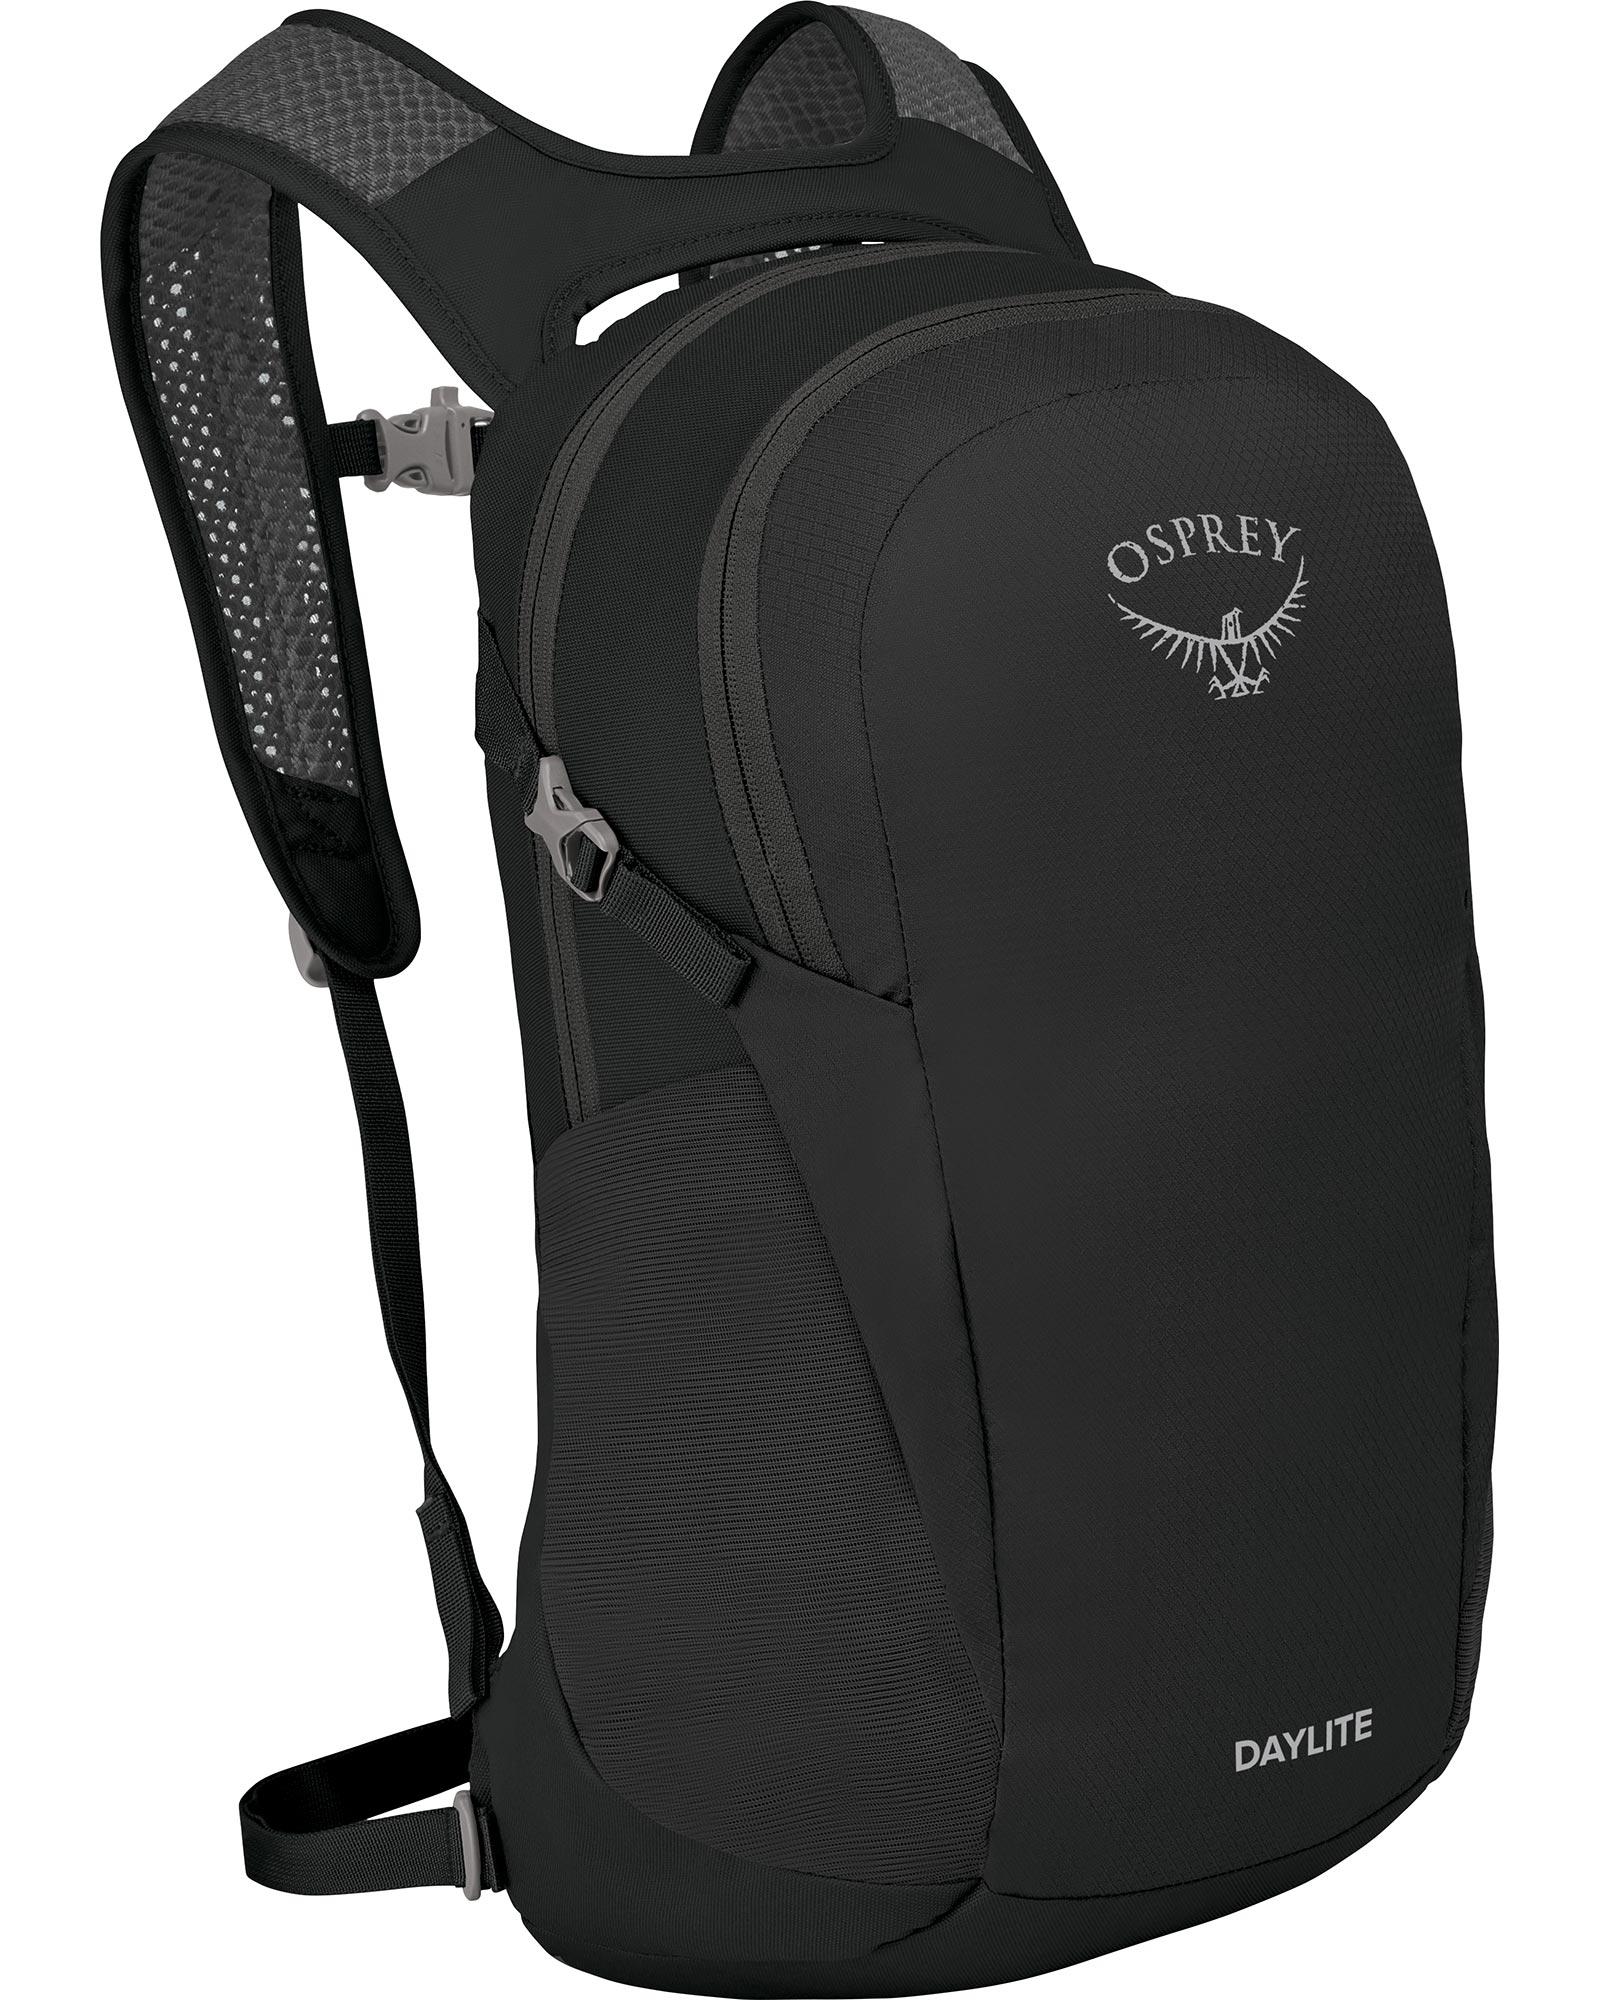 Osprey Daylite Backpack 0